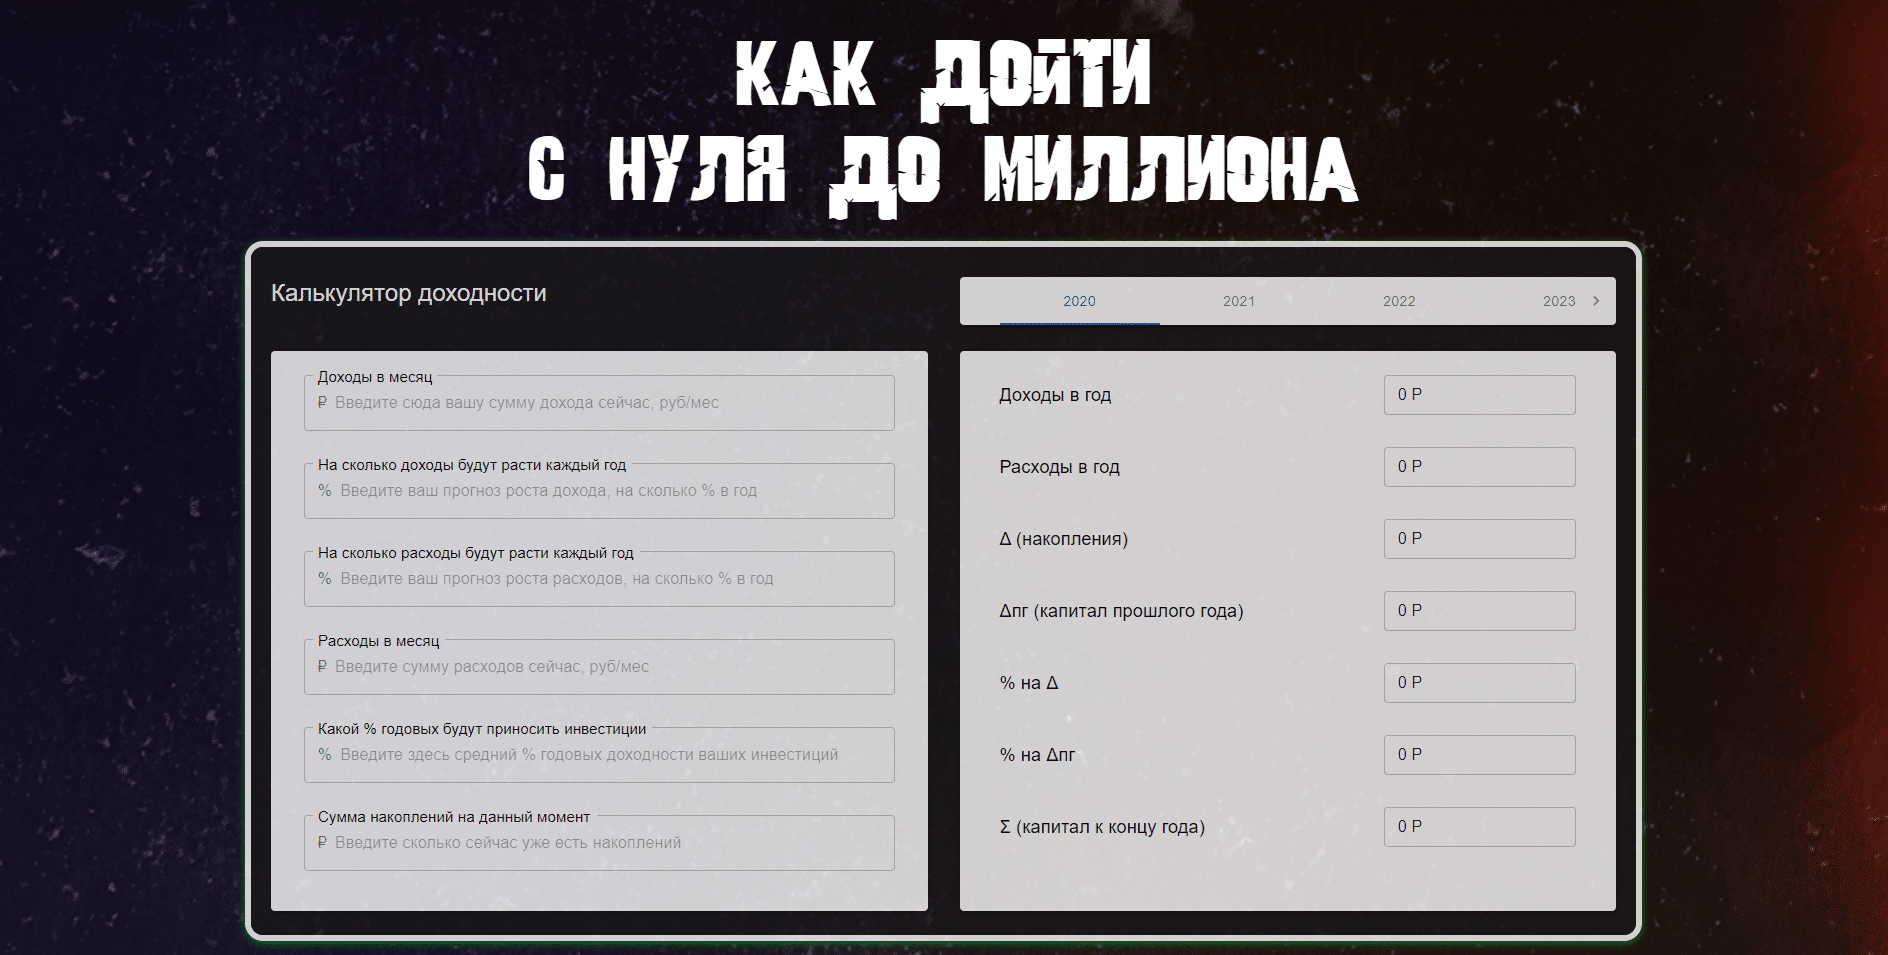 practicalinvesting.ru отзывы о проекте